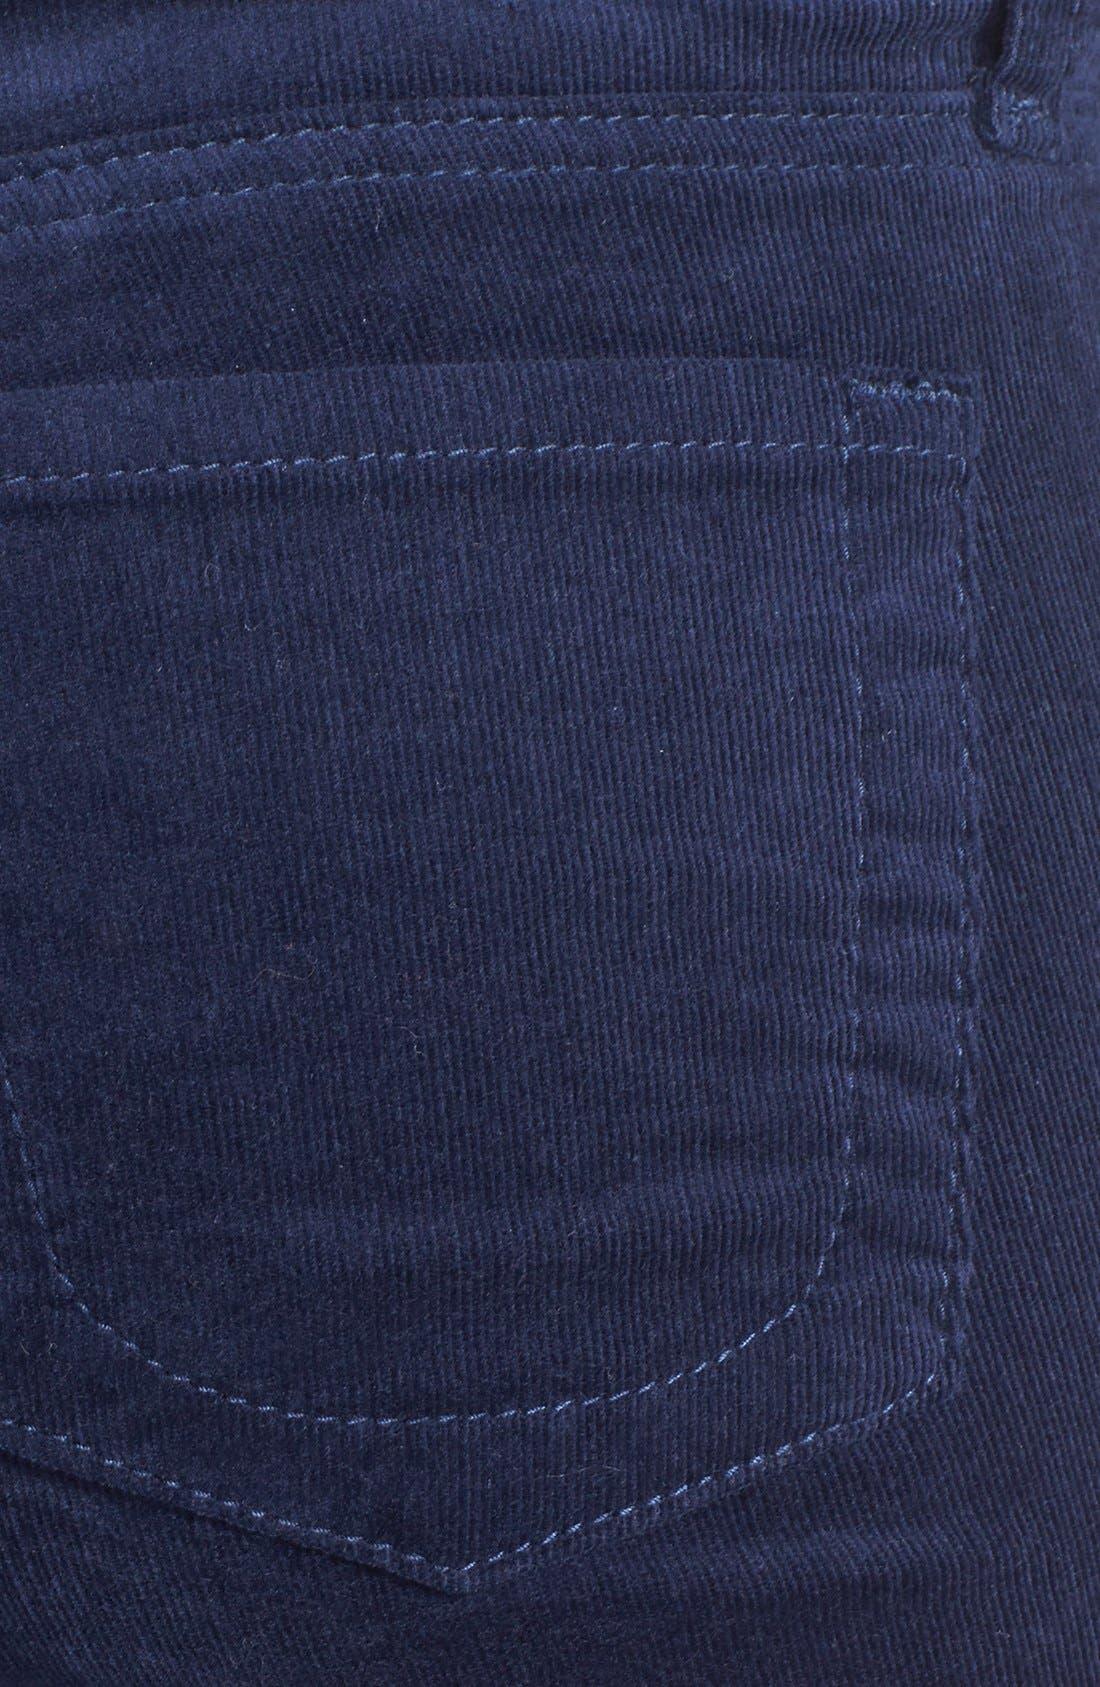 'Diana' Stretch Corduroy Skinny Pants,                             Alternate thumbnail 185, color,